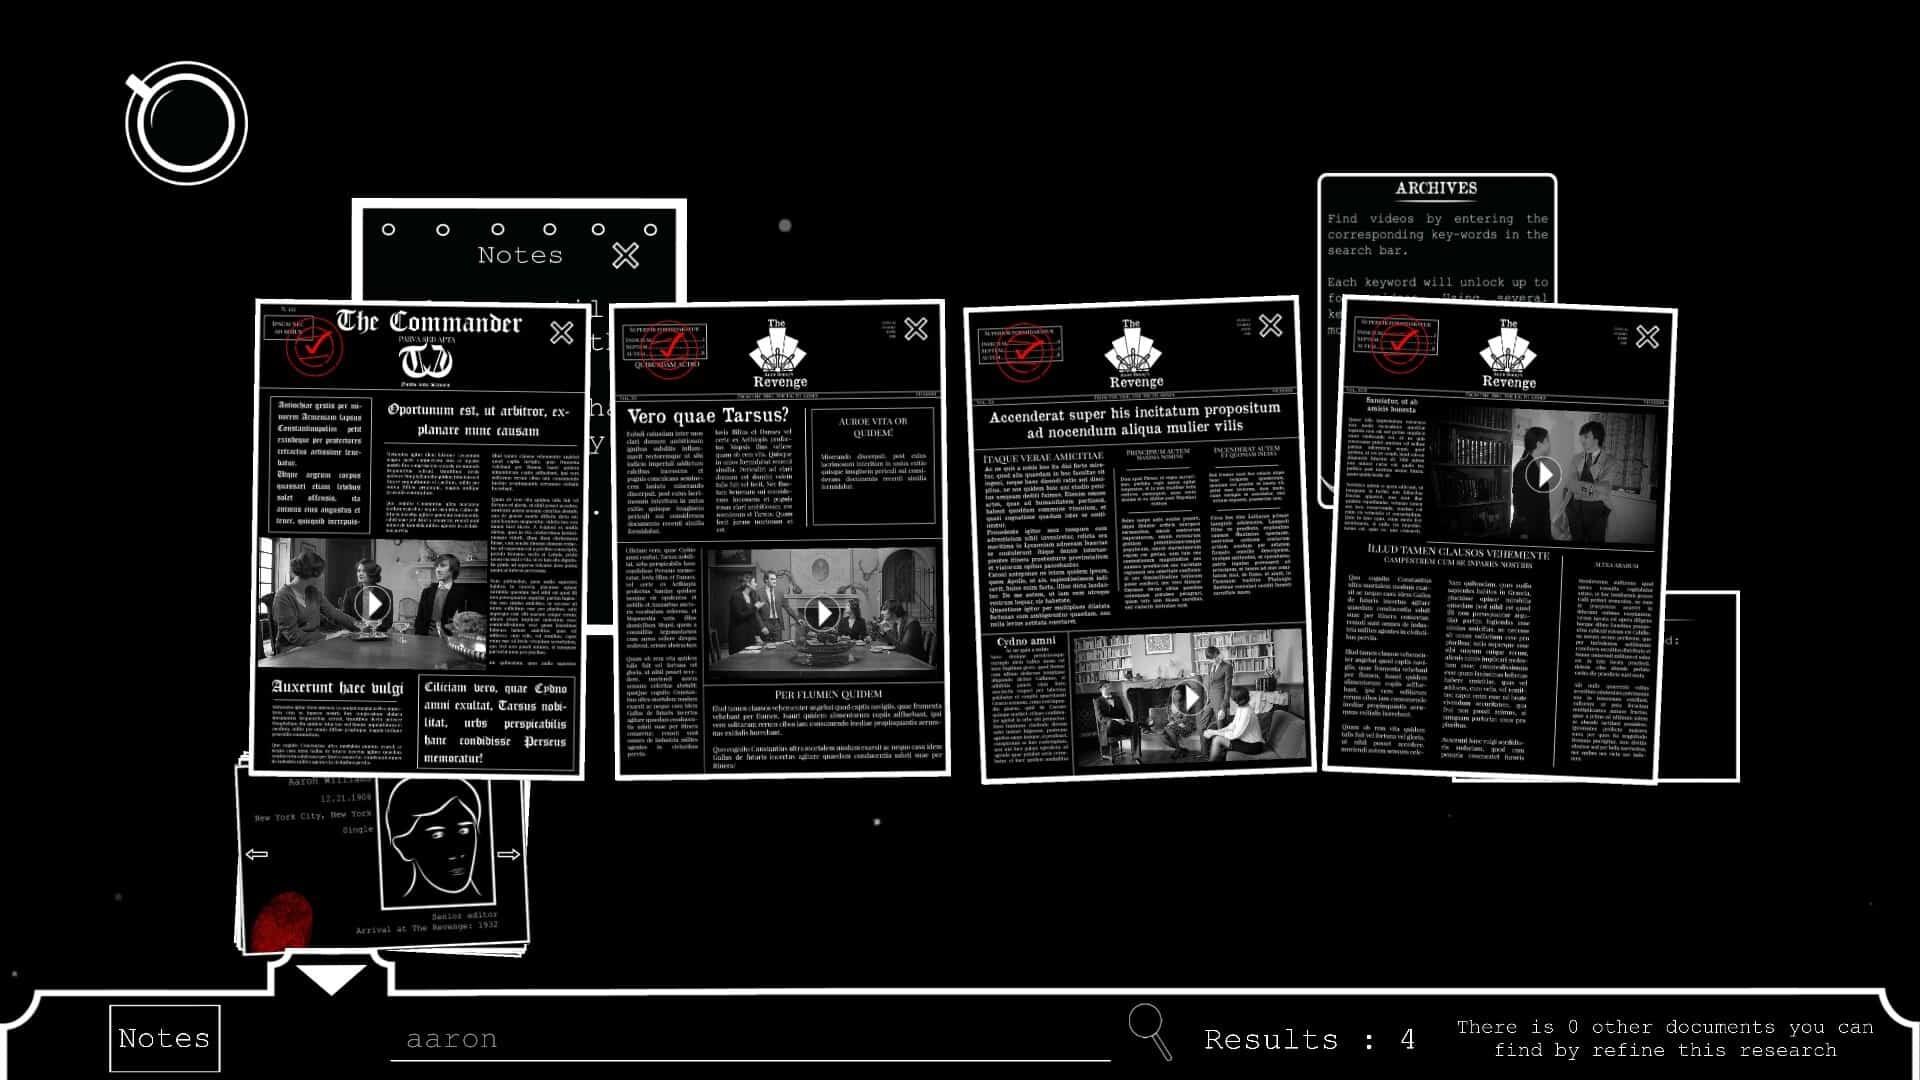 How to Shoot a Criminal game screenshot 2